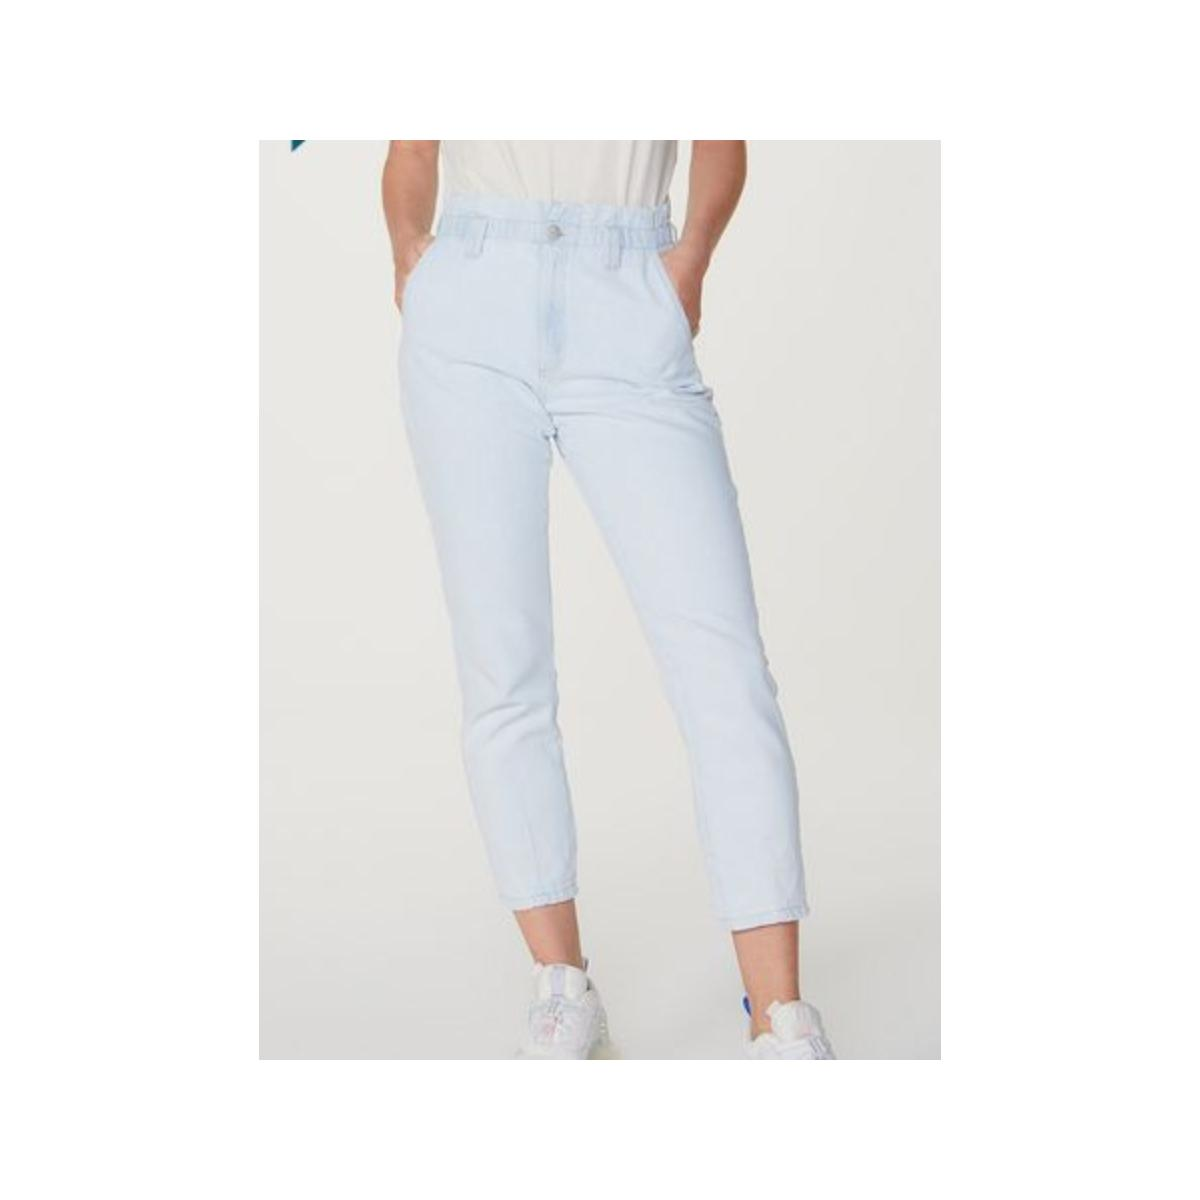 Calça Feminina Hering H9b0  1bsn Jeans Claro